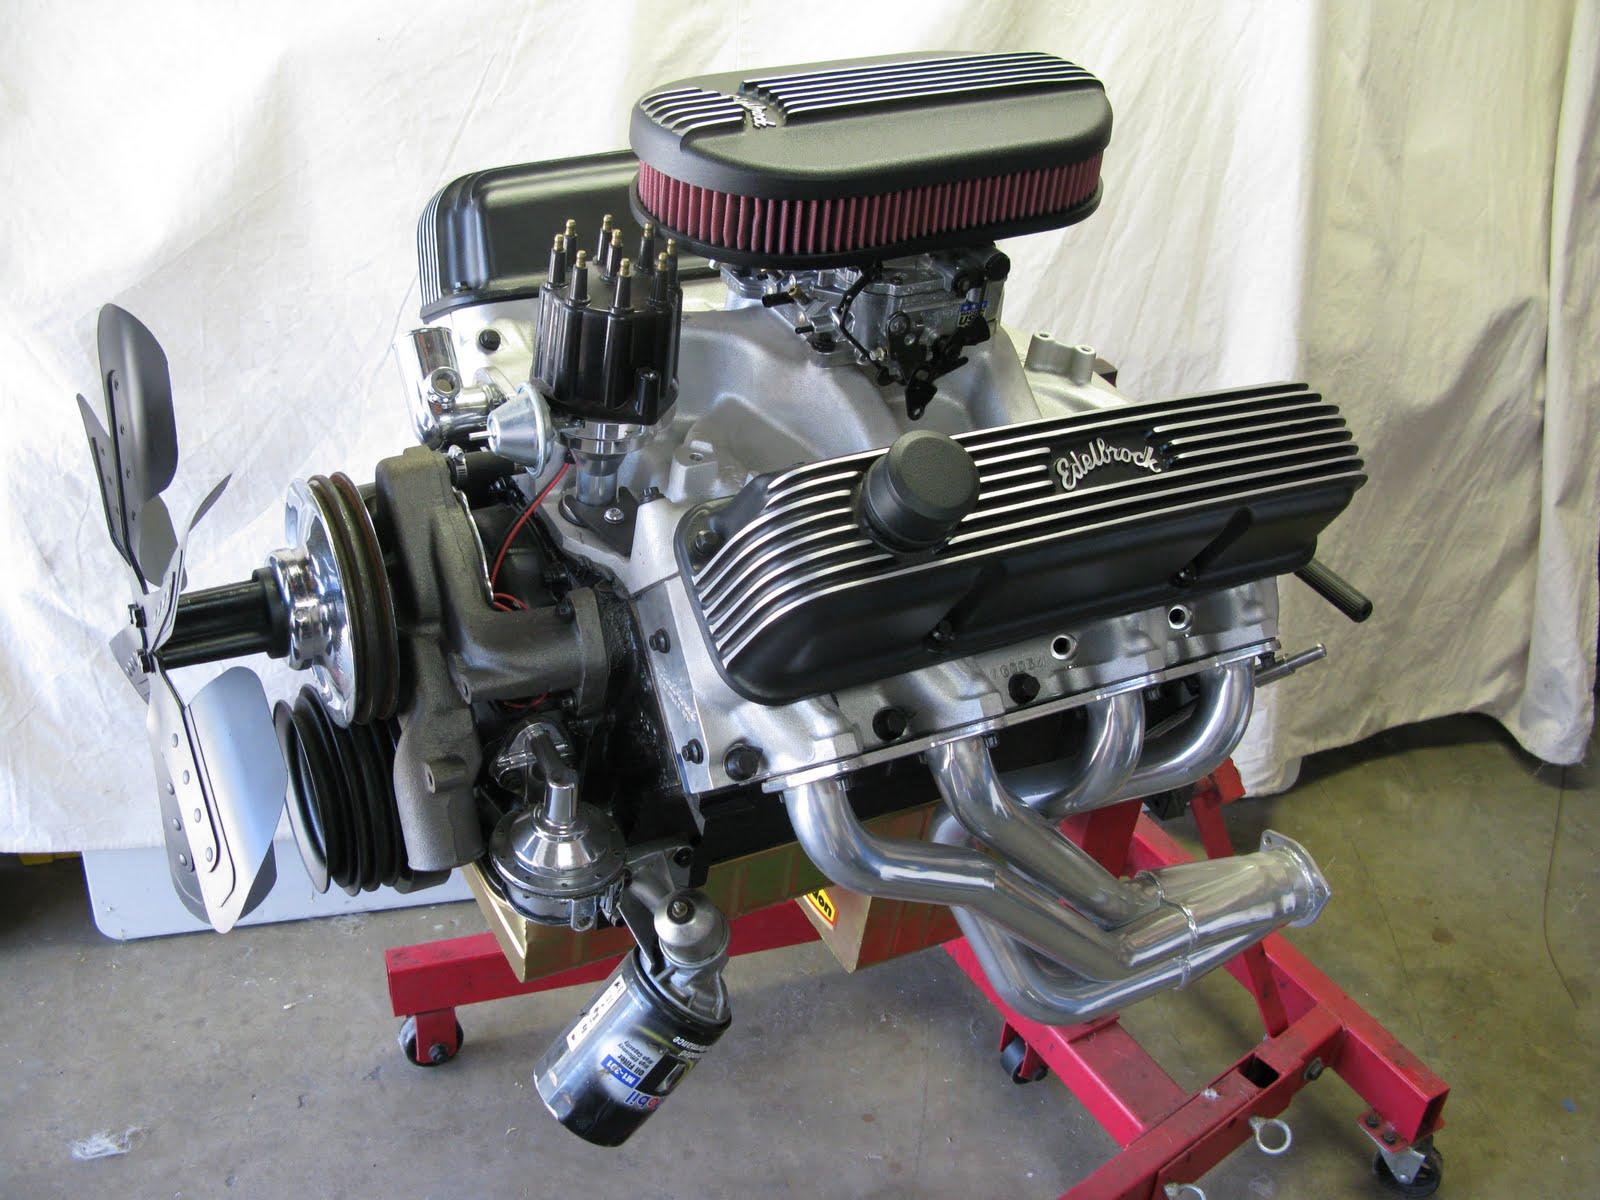 Ford Mustang 289 Engine Diagram Timing Specs Custom Project Wiring Genesis 1966 428 Block 427